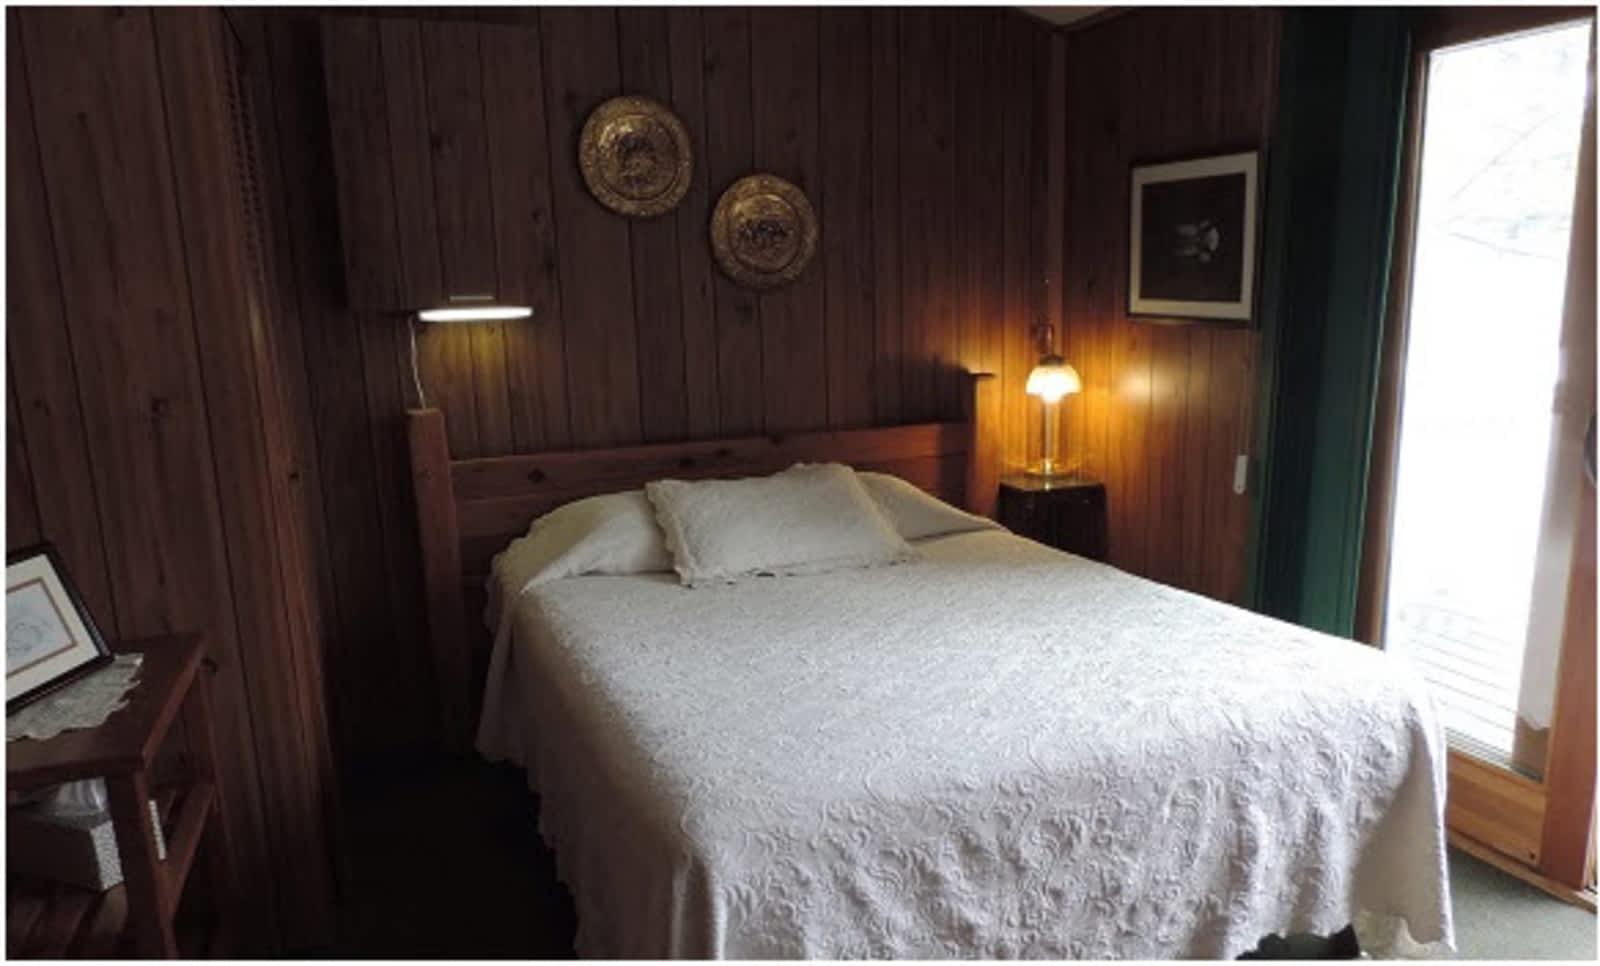 Inverness Falls Resort - Opening Hours - Whiteshell Park